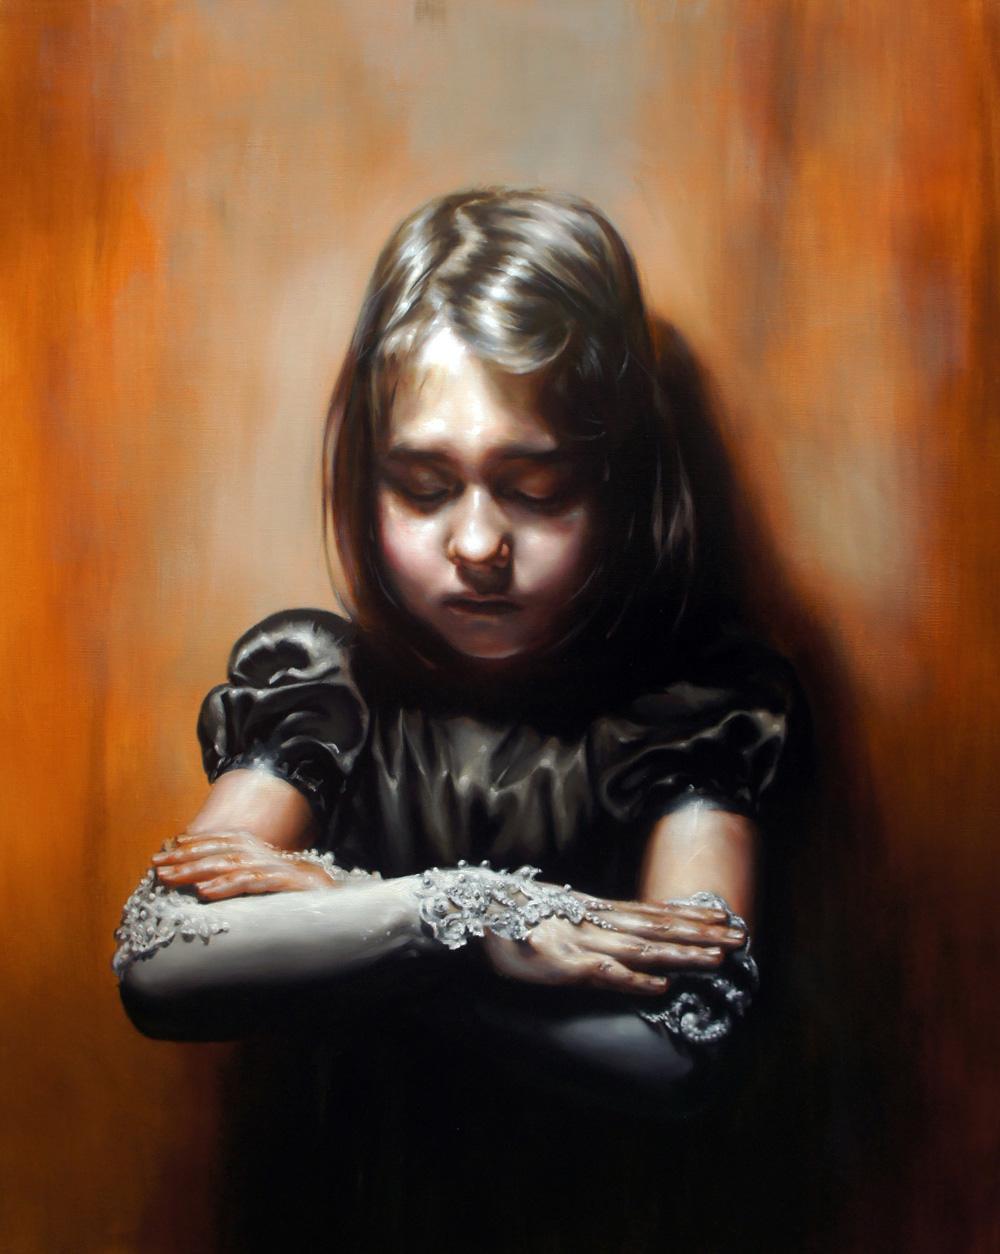 Flavia Pitis, Soul with a hole, 2013, oil on canvas, 100x80cm